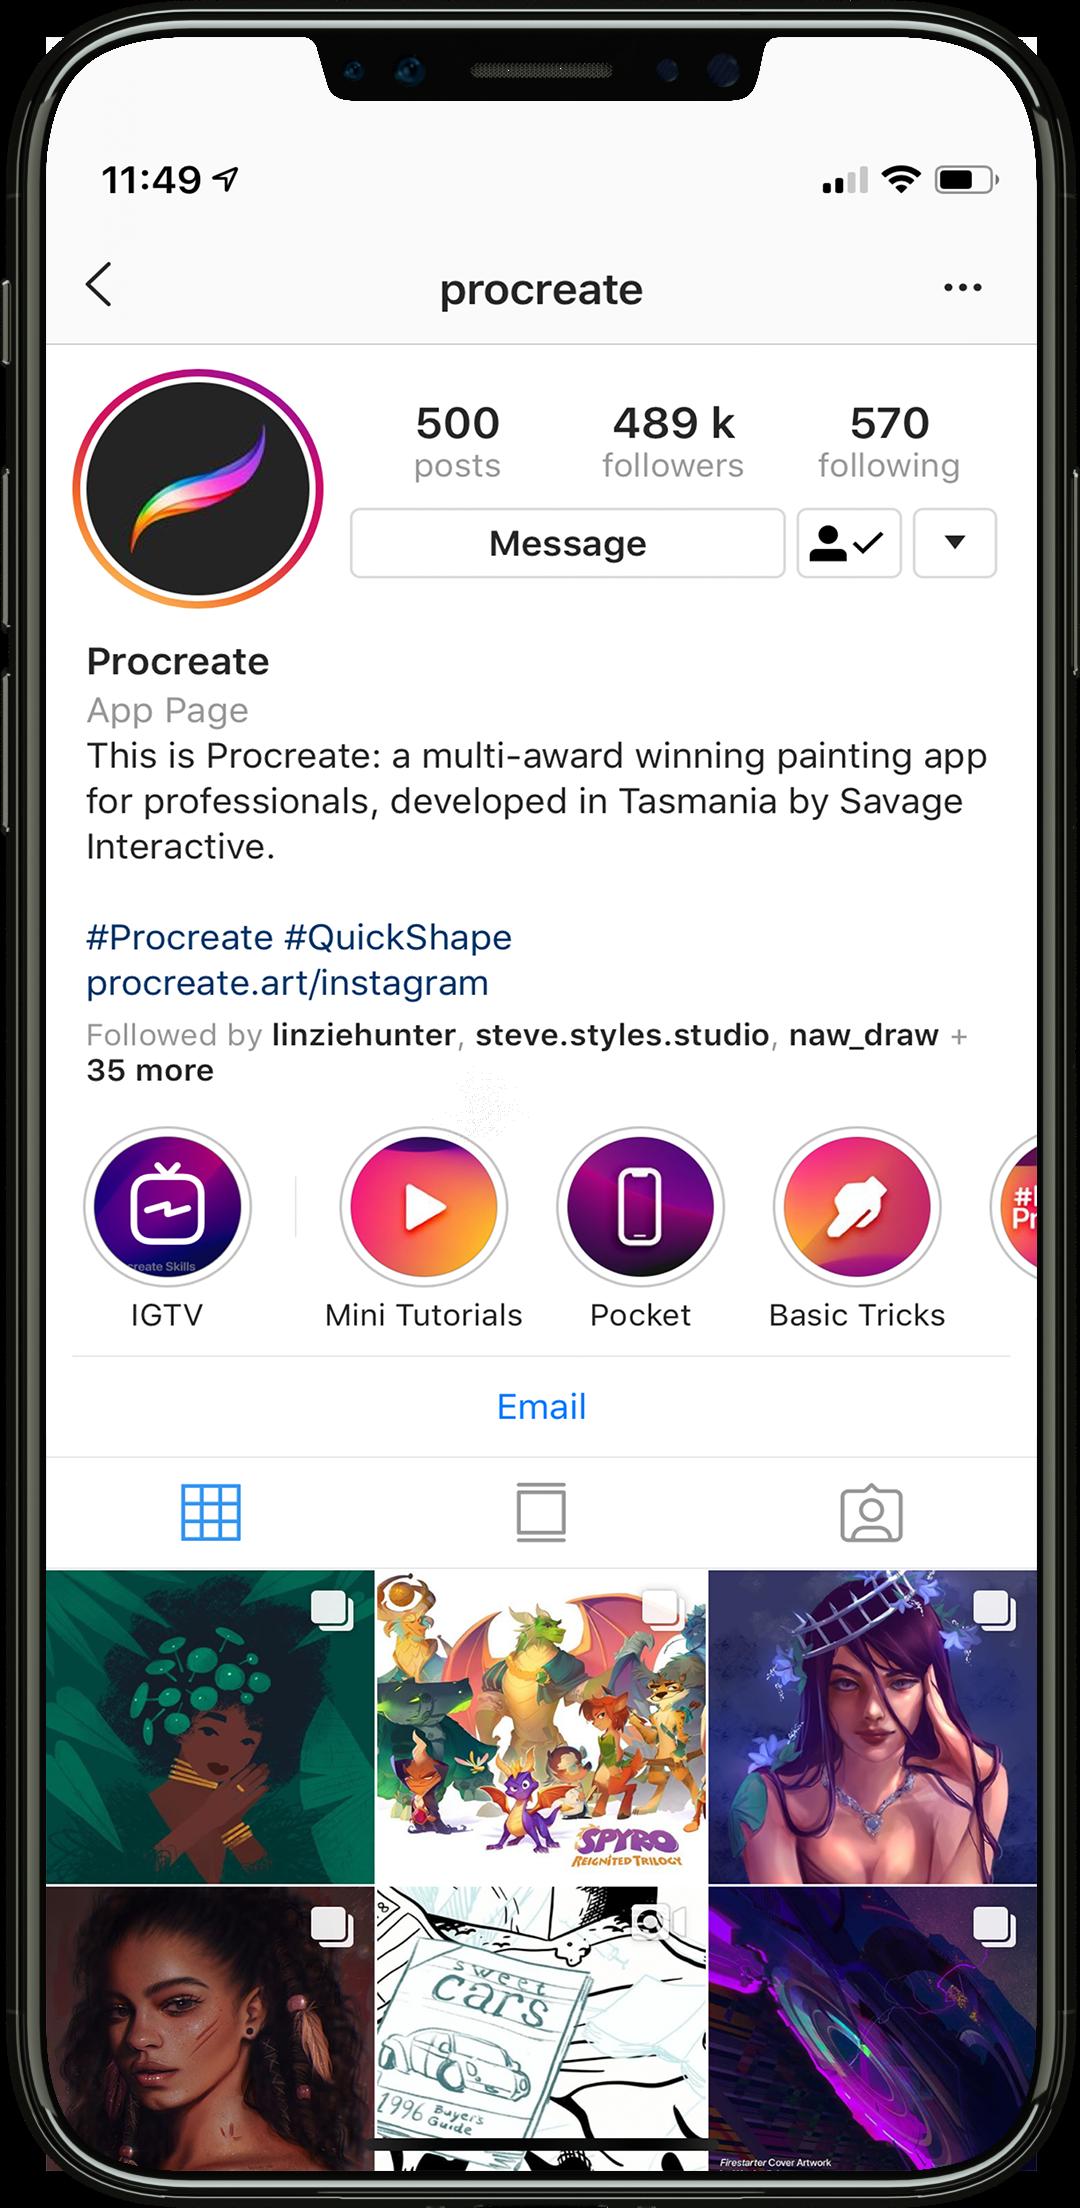 procreate instagram photos